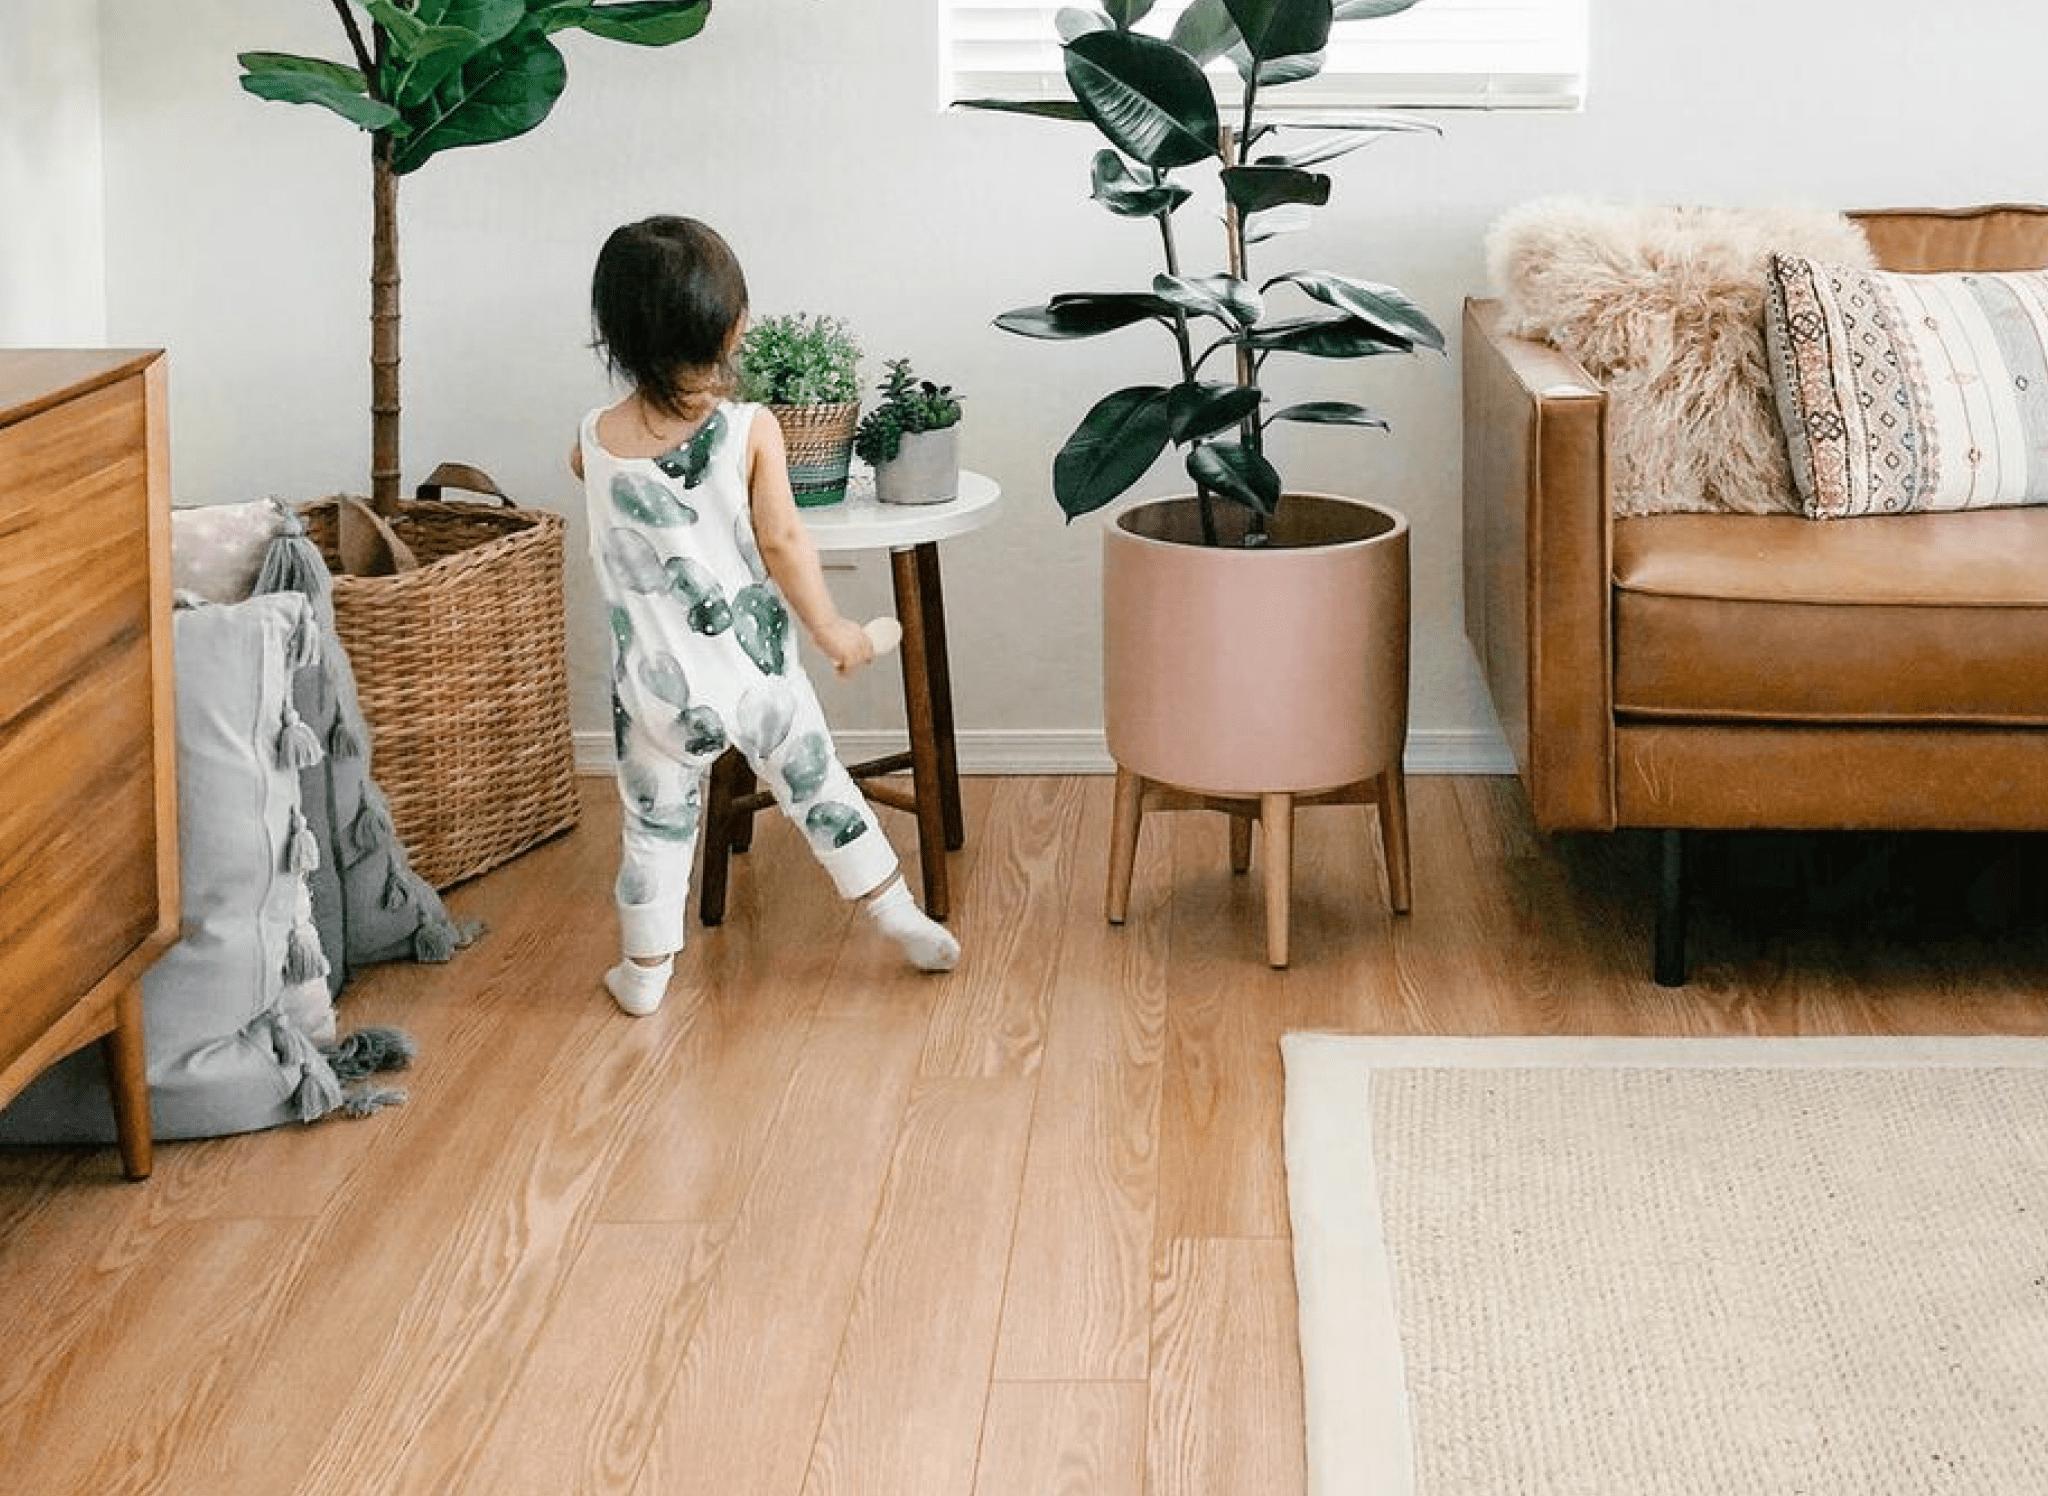 child walking on hardwood laminate flooring in living room